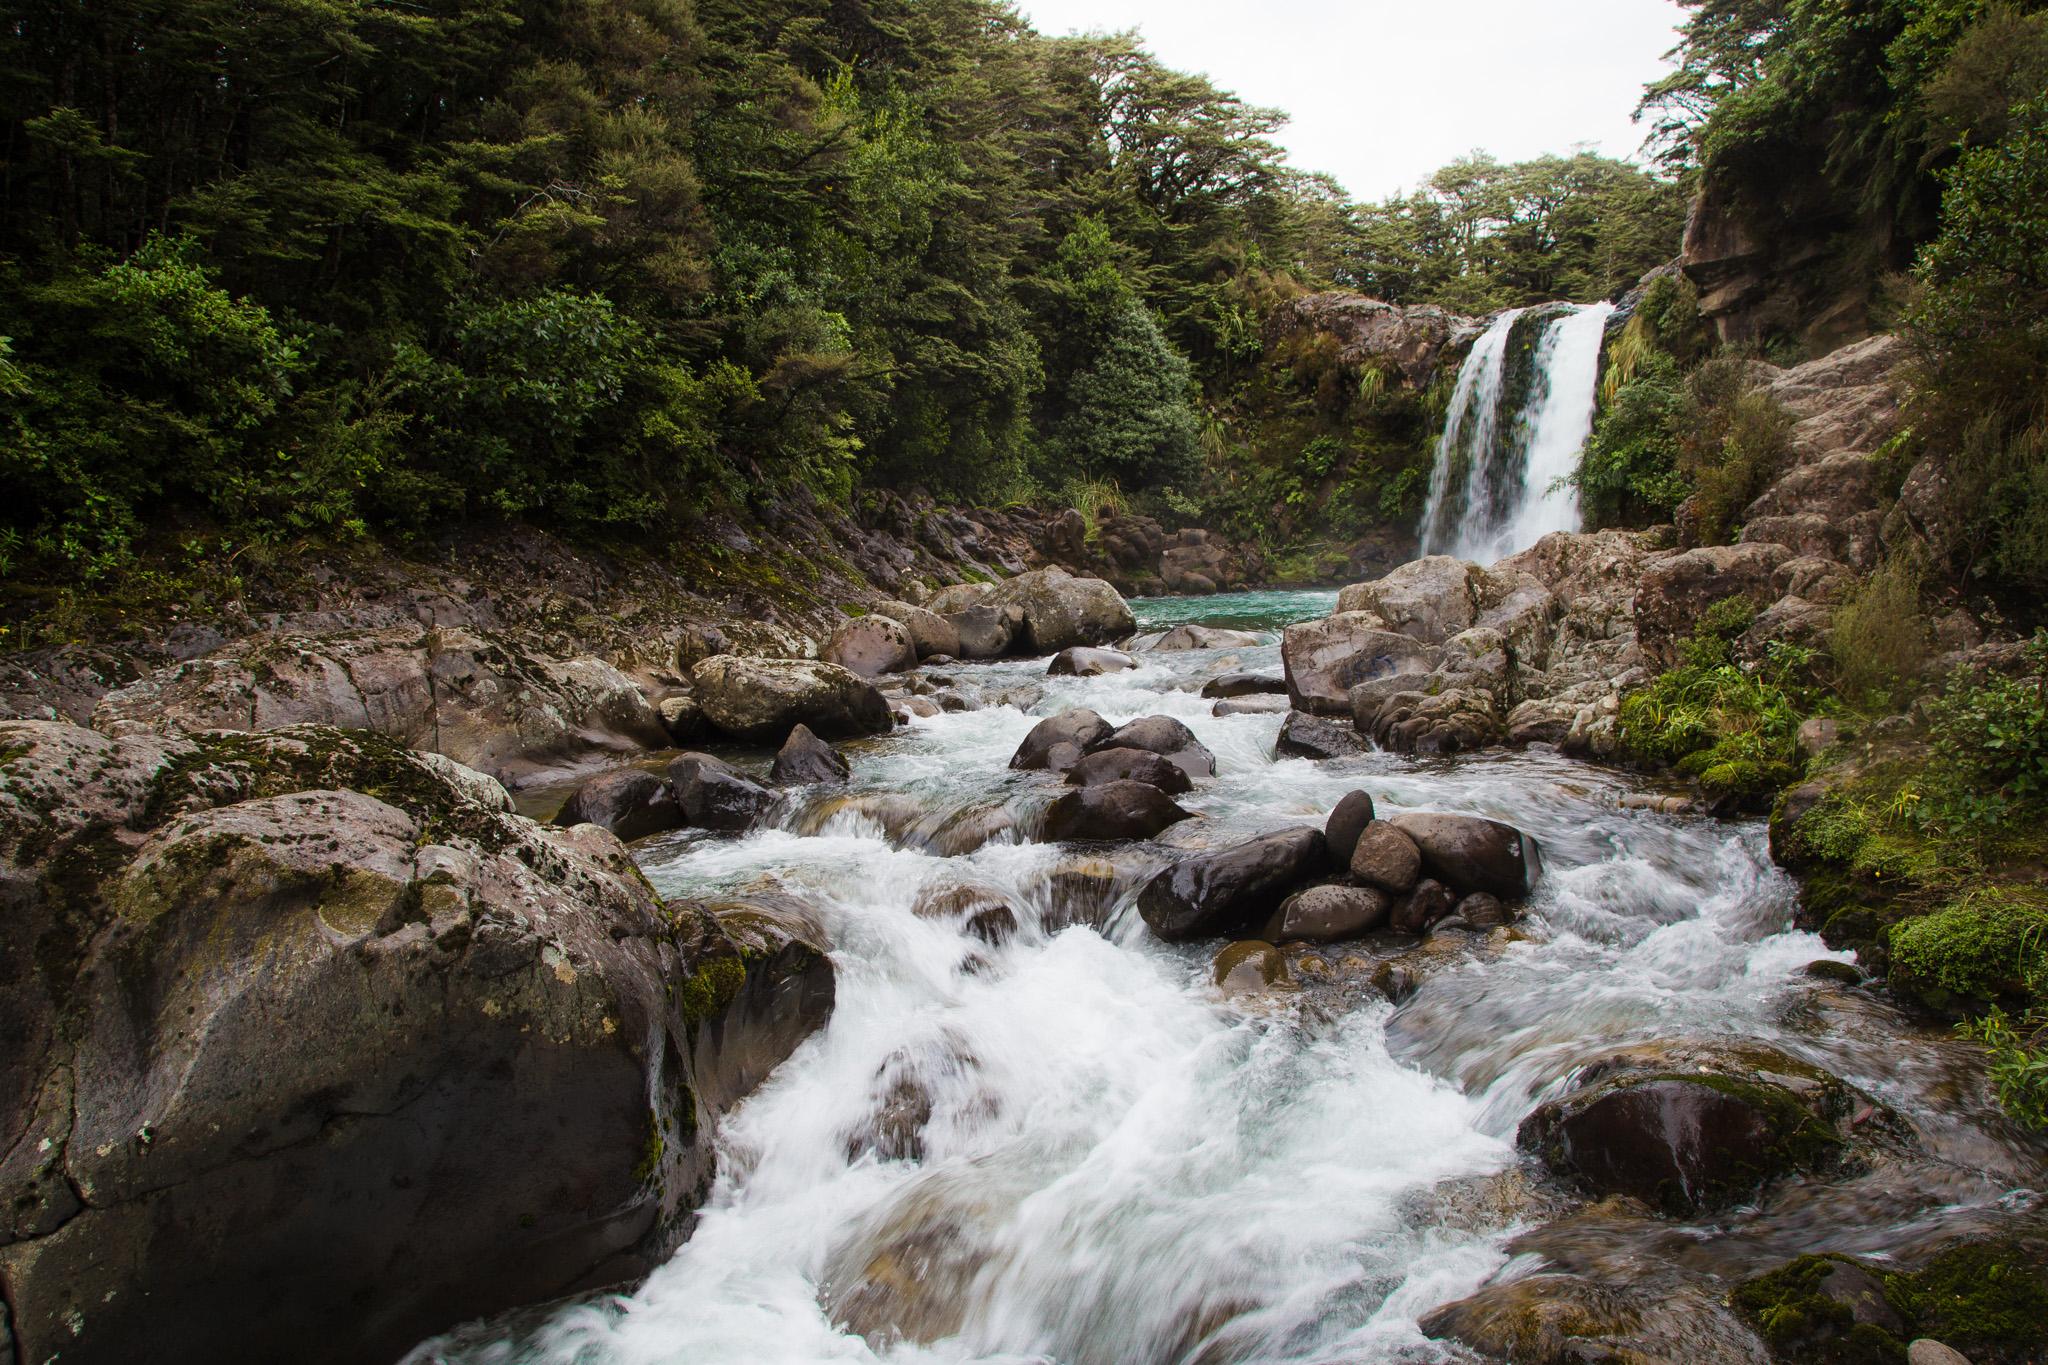 Waterfalls in Tongariro National Park